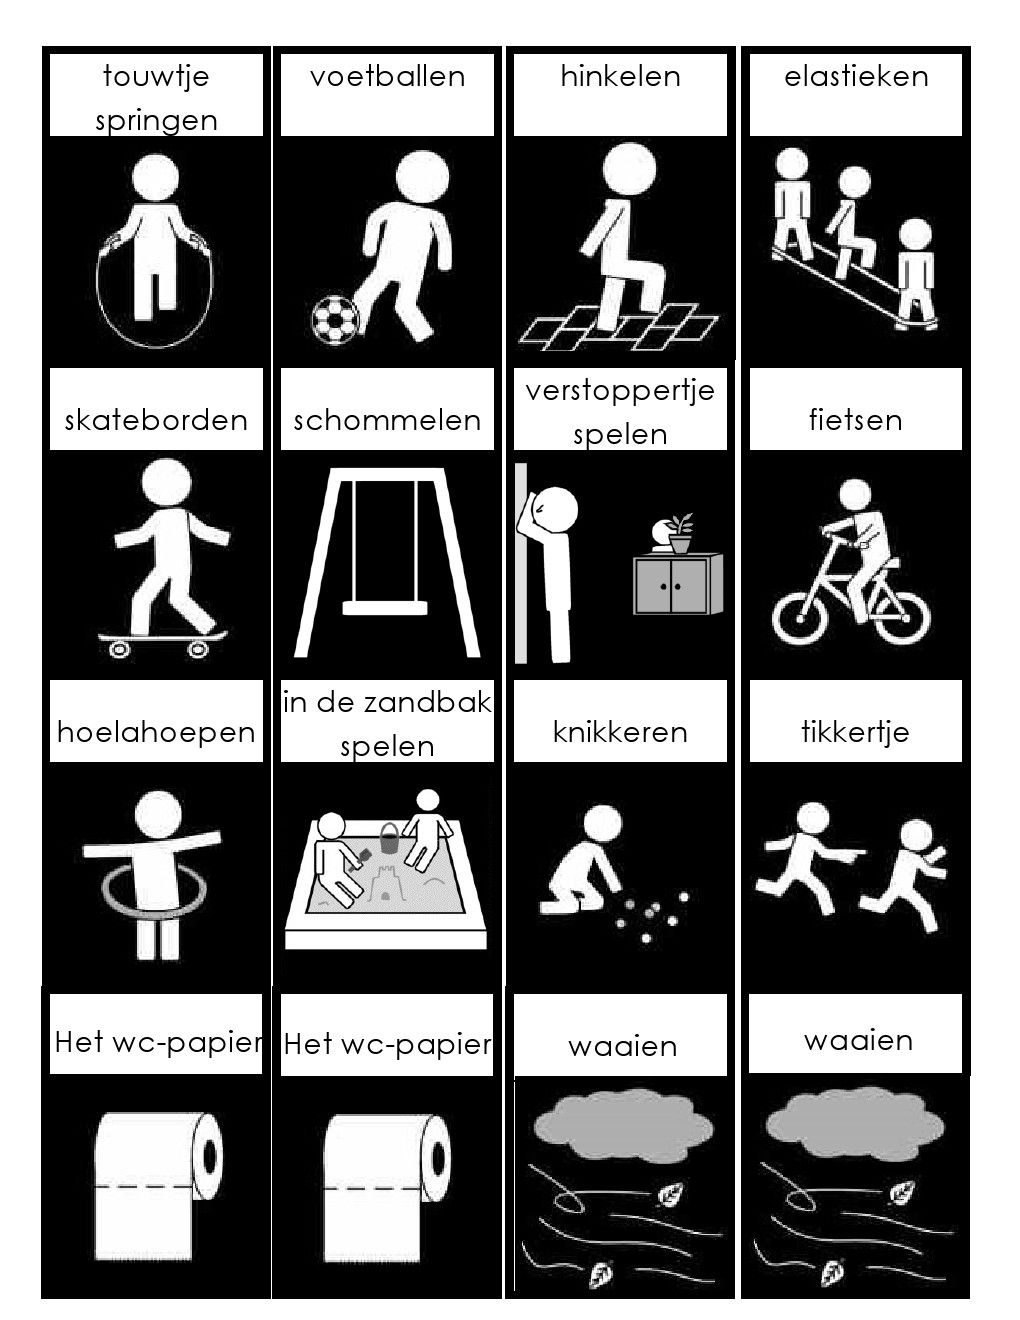 Zeer School Pictogrammen Autisme - ARCHIDEV @SZ02